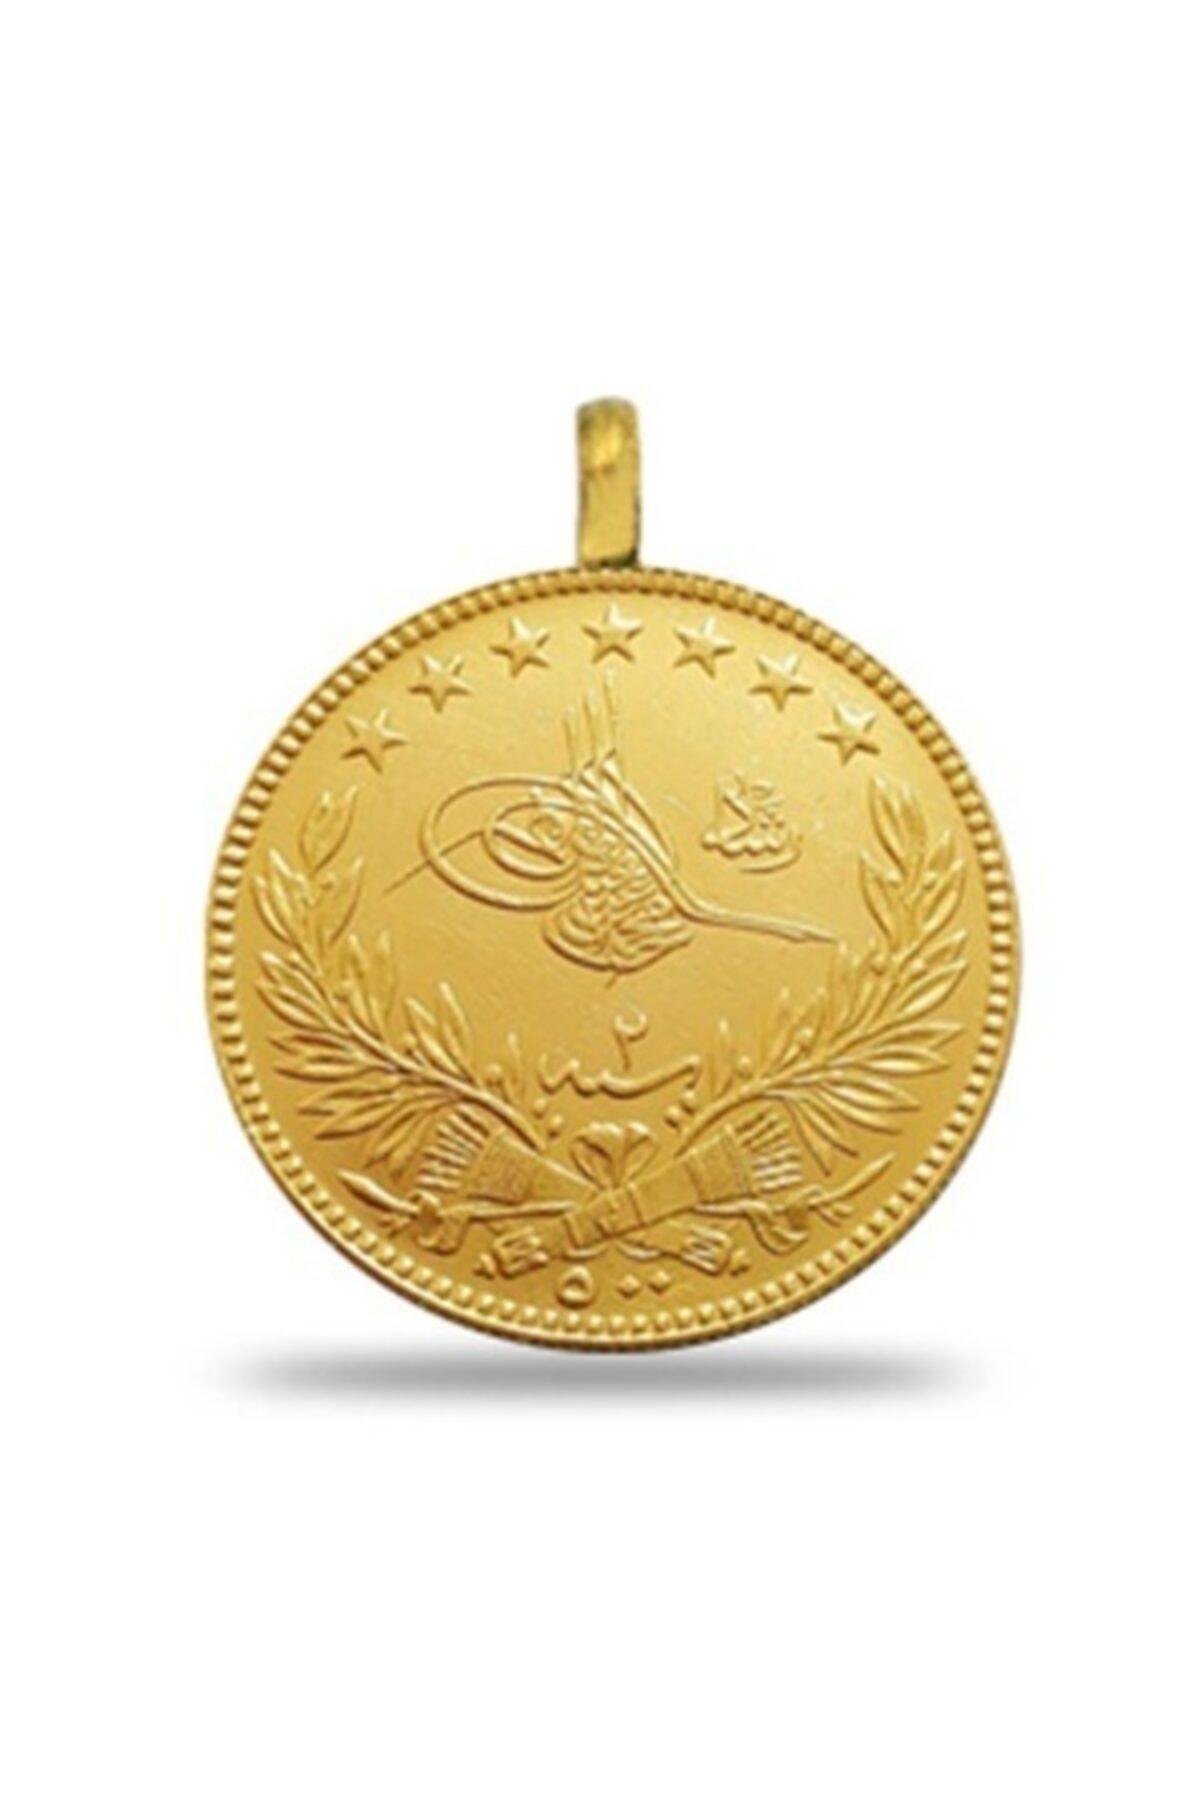 916 Gold | Yarim Resat Altin